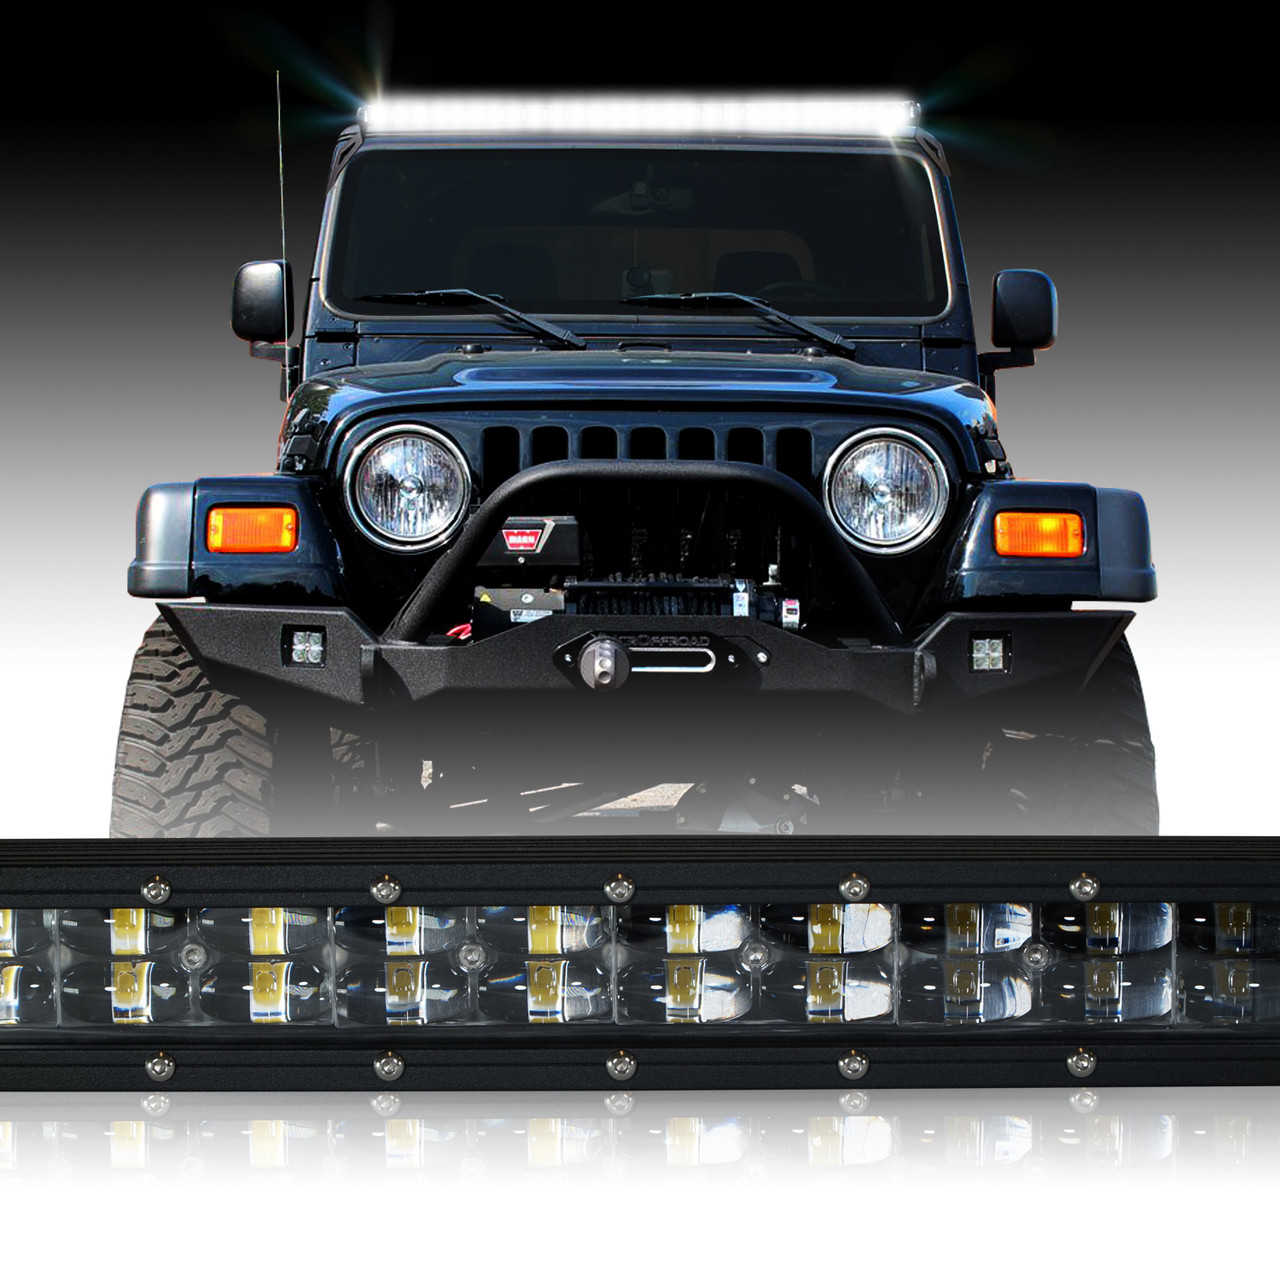 2006 Jeep Wrangler Wiring Harness Wiring Diagram 2008 Jeep Wrangler Fuel  Injectors 2000 Jeep Wrangler Wiring Harness